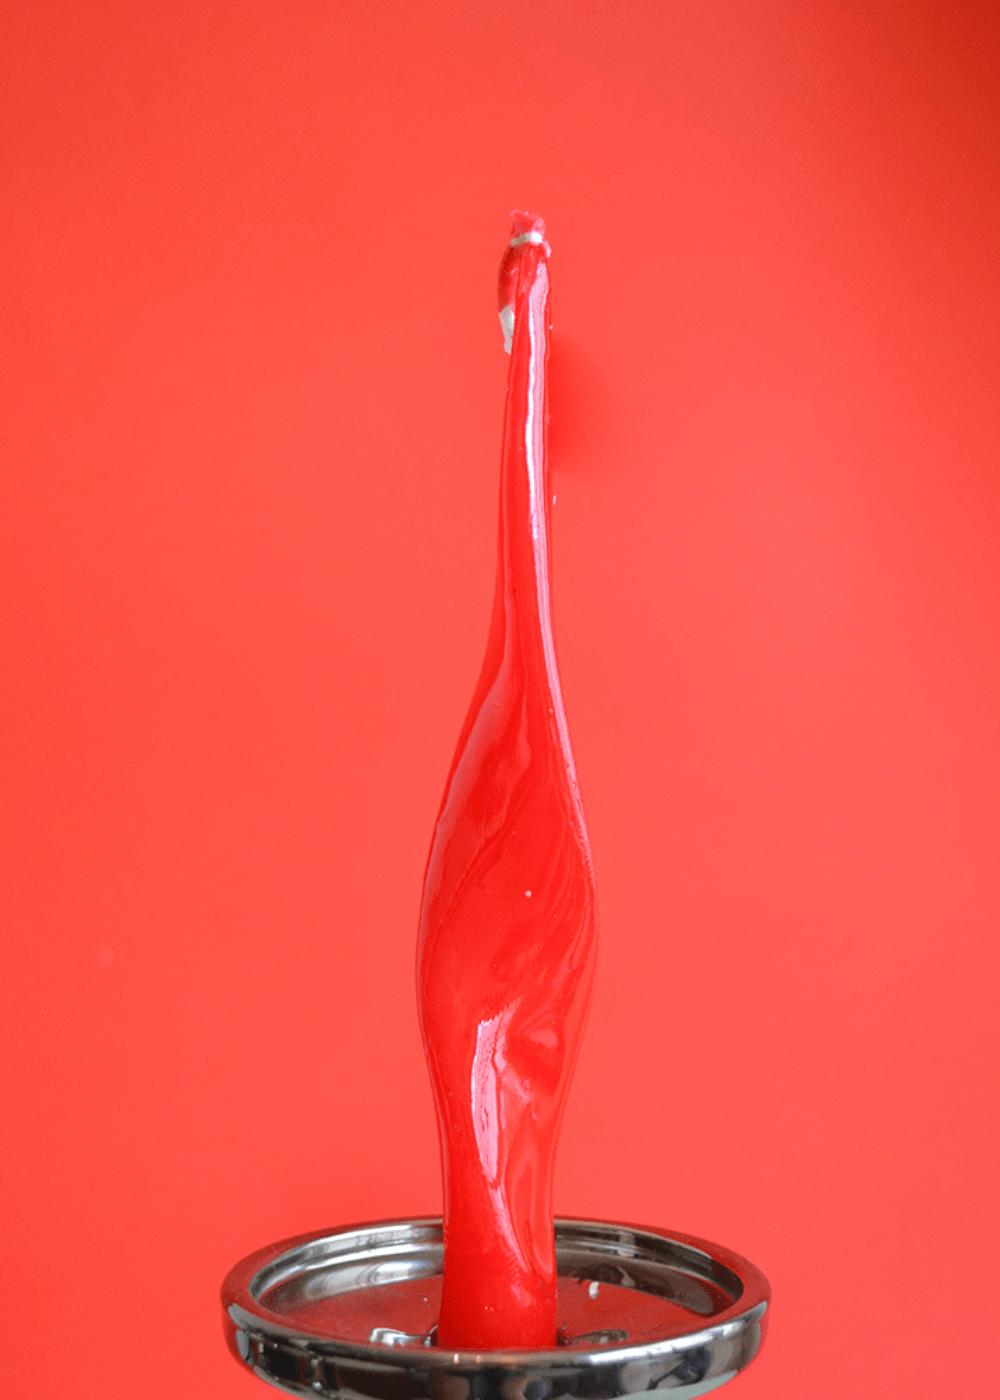 velaondavermelha